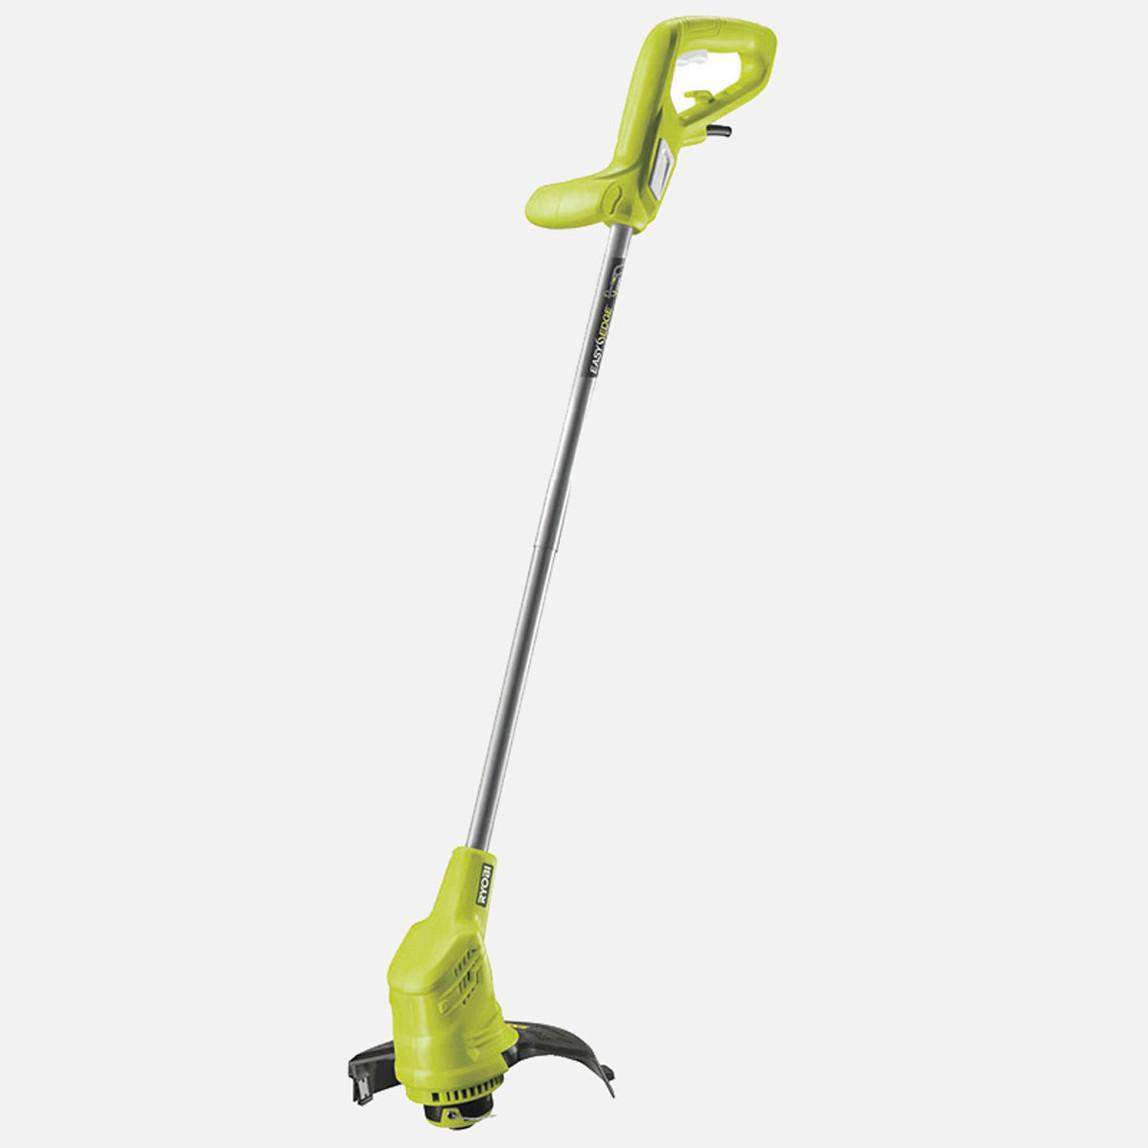 Elektrikli Misinalı Çim Biçme Makinası   Rlt3525